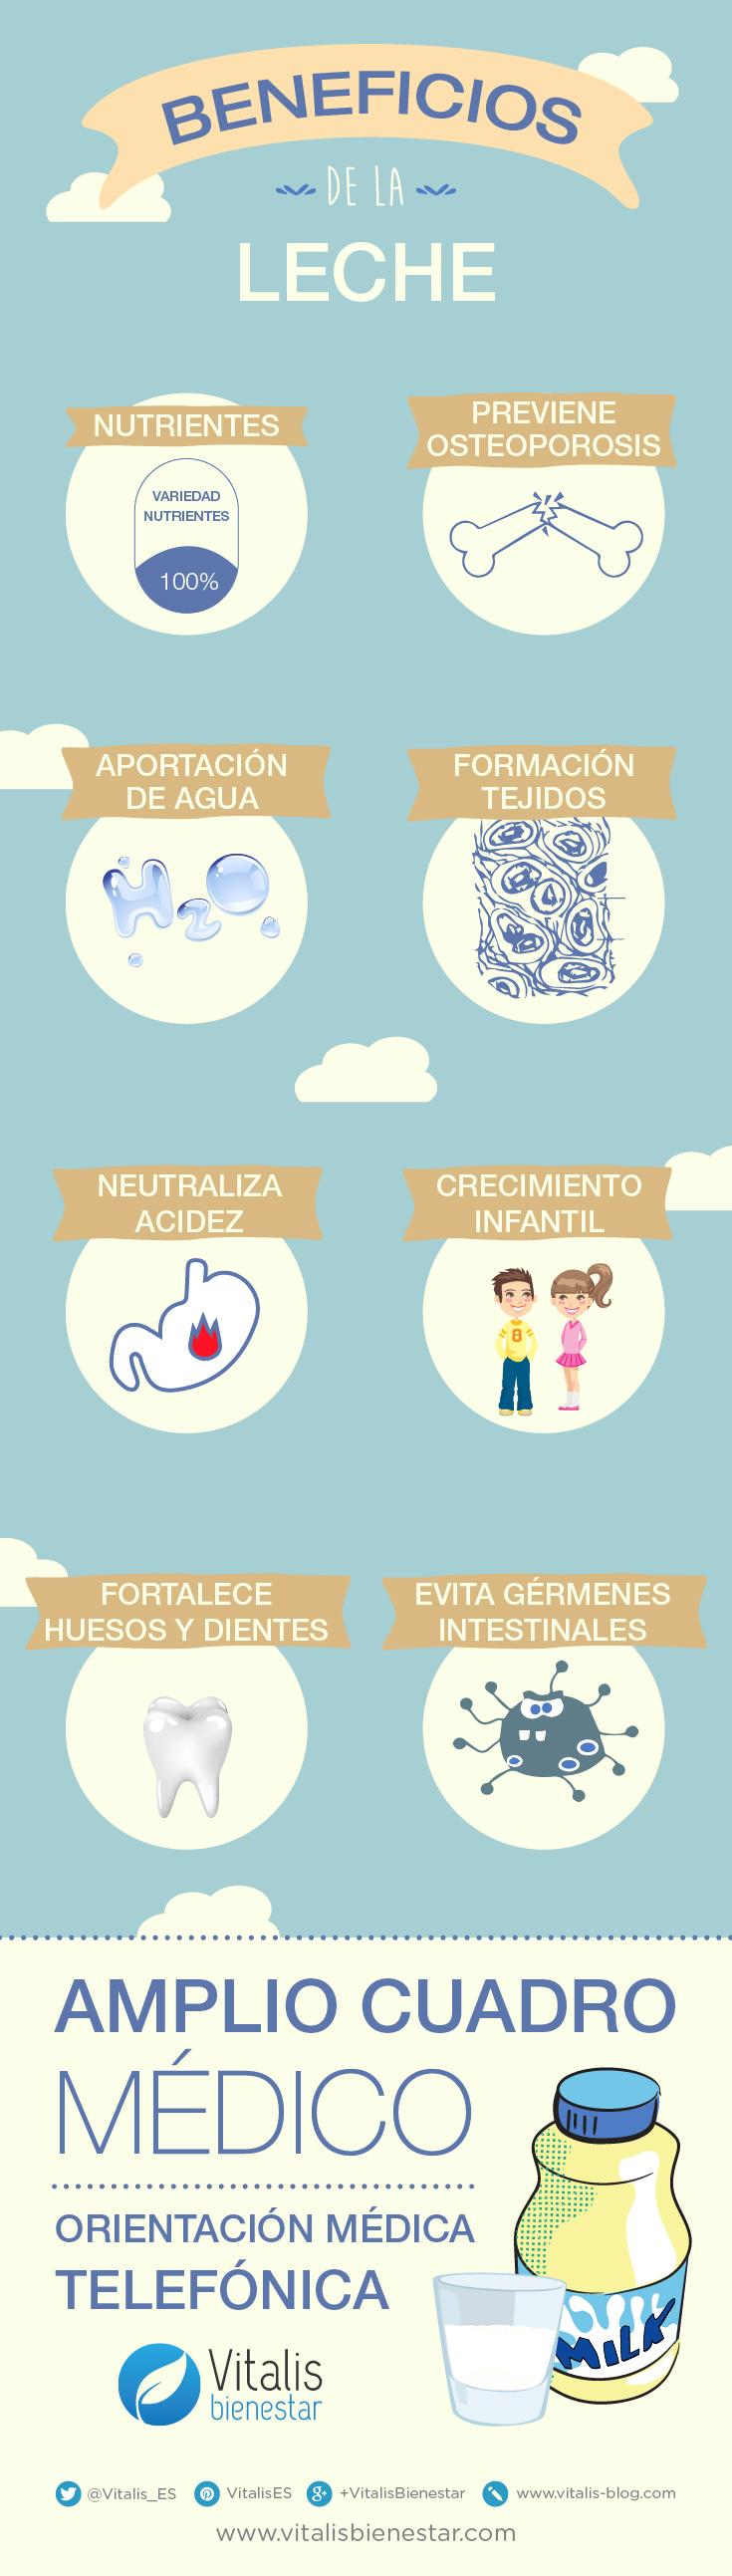 beneficios de la leche - Vitalis Bienestar - infografia